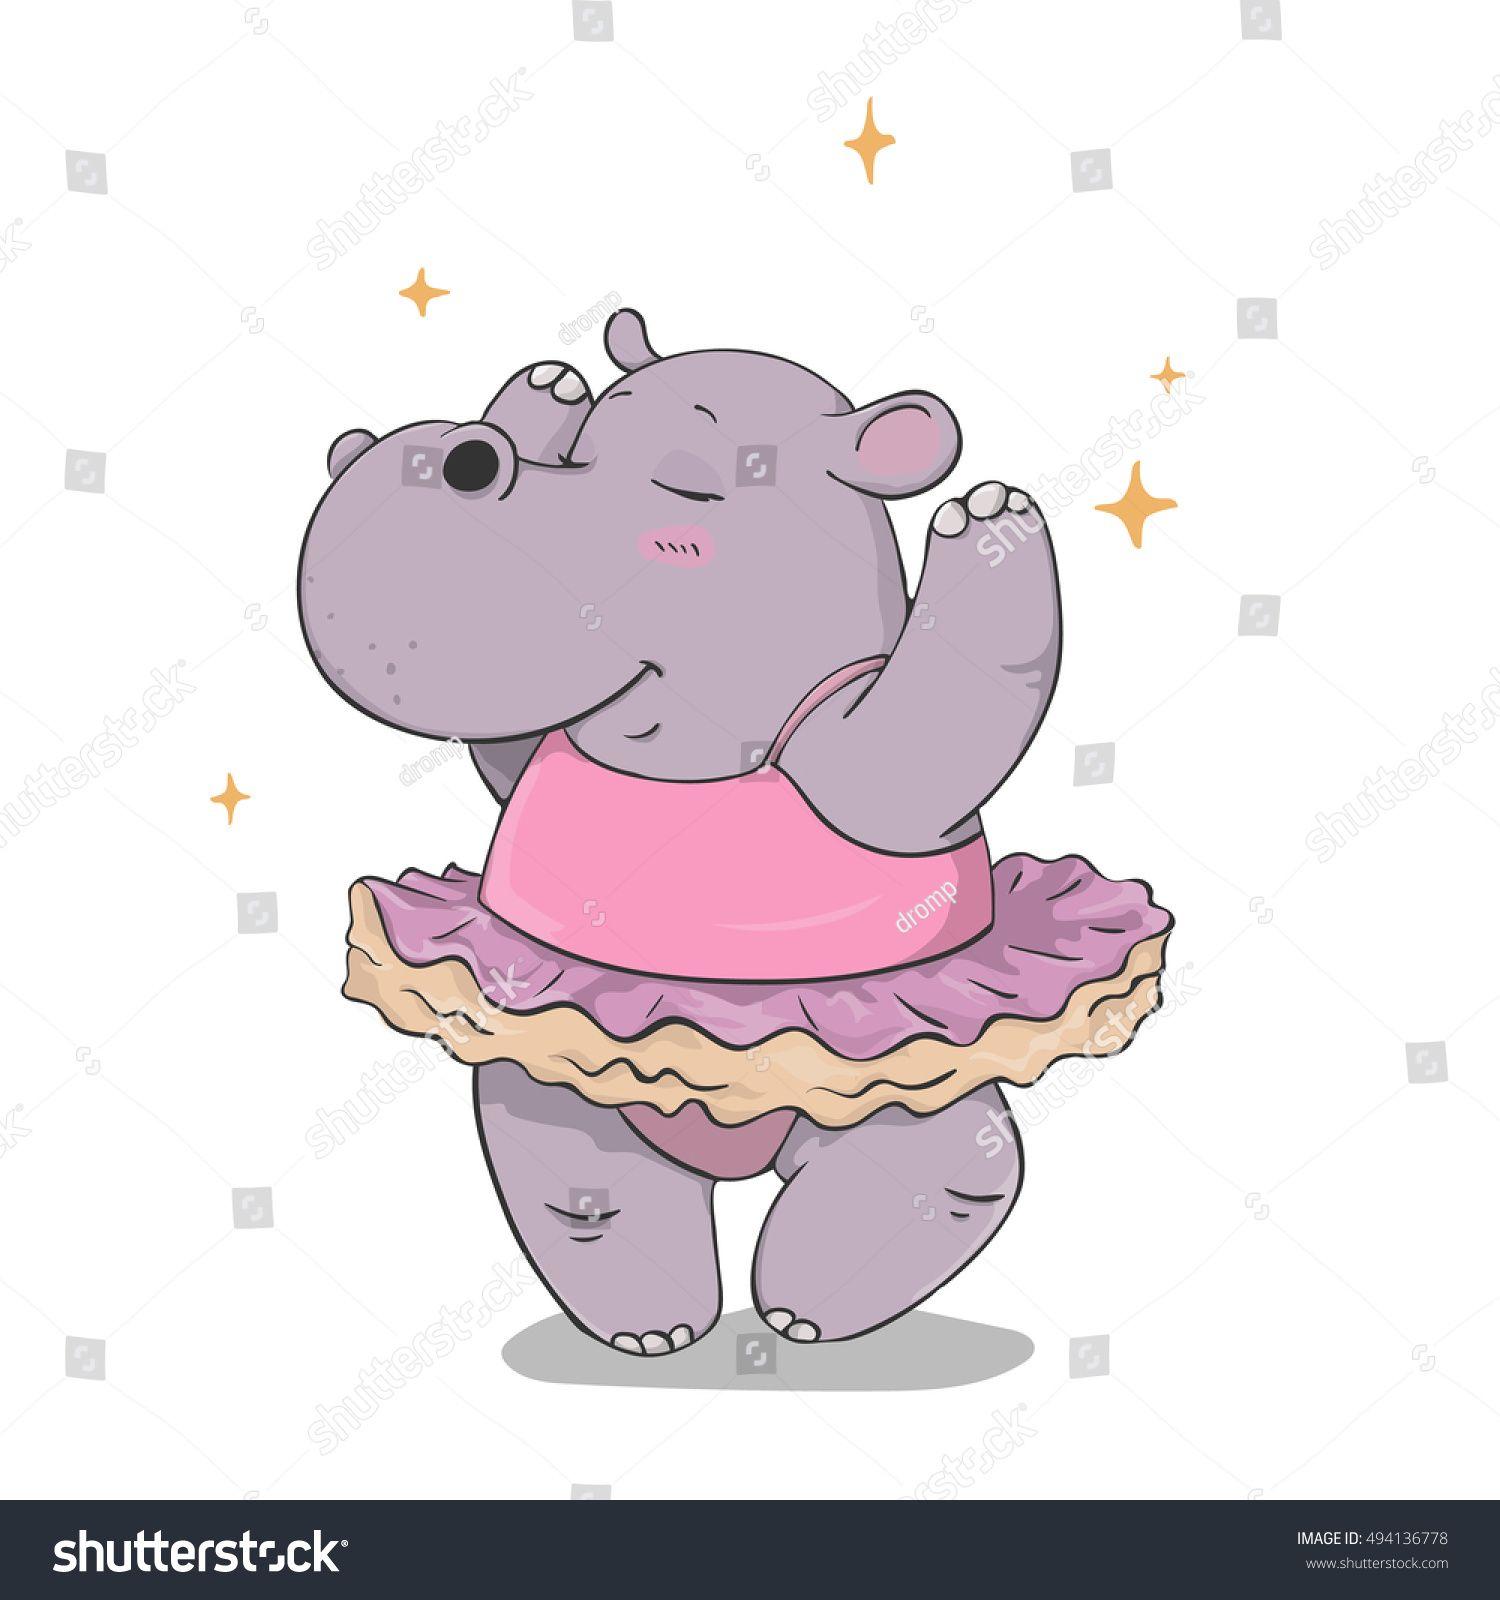 Hippo clipart ballerina. Dancing cartoon hand drawn